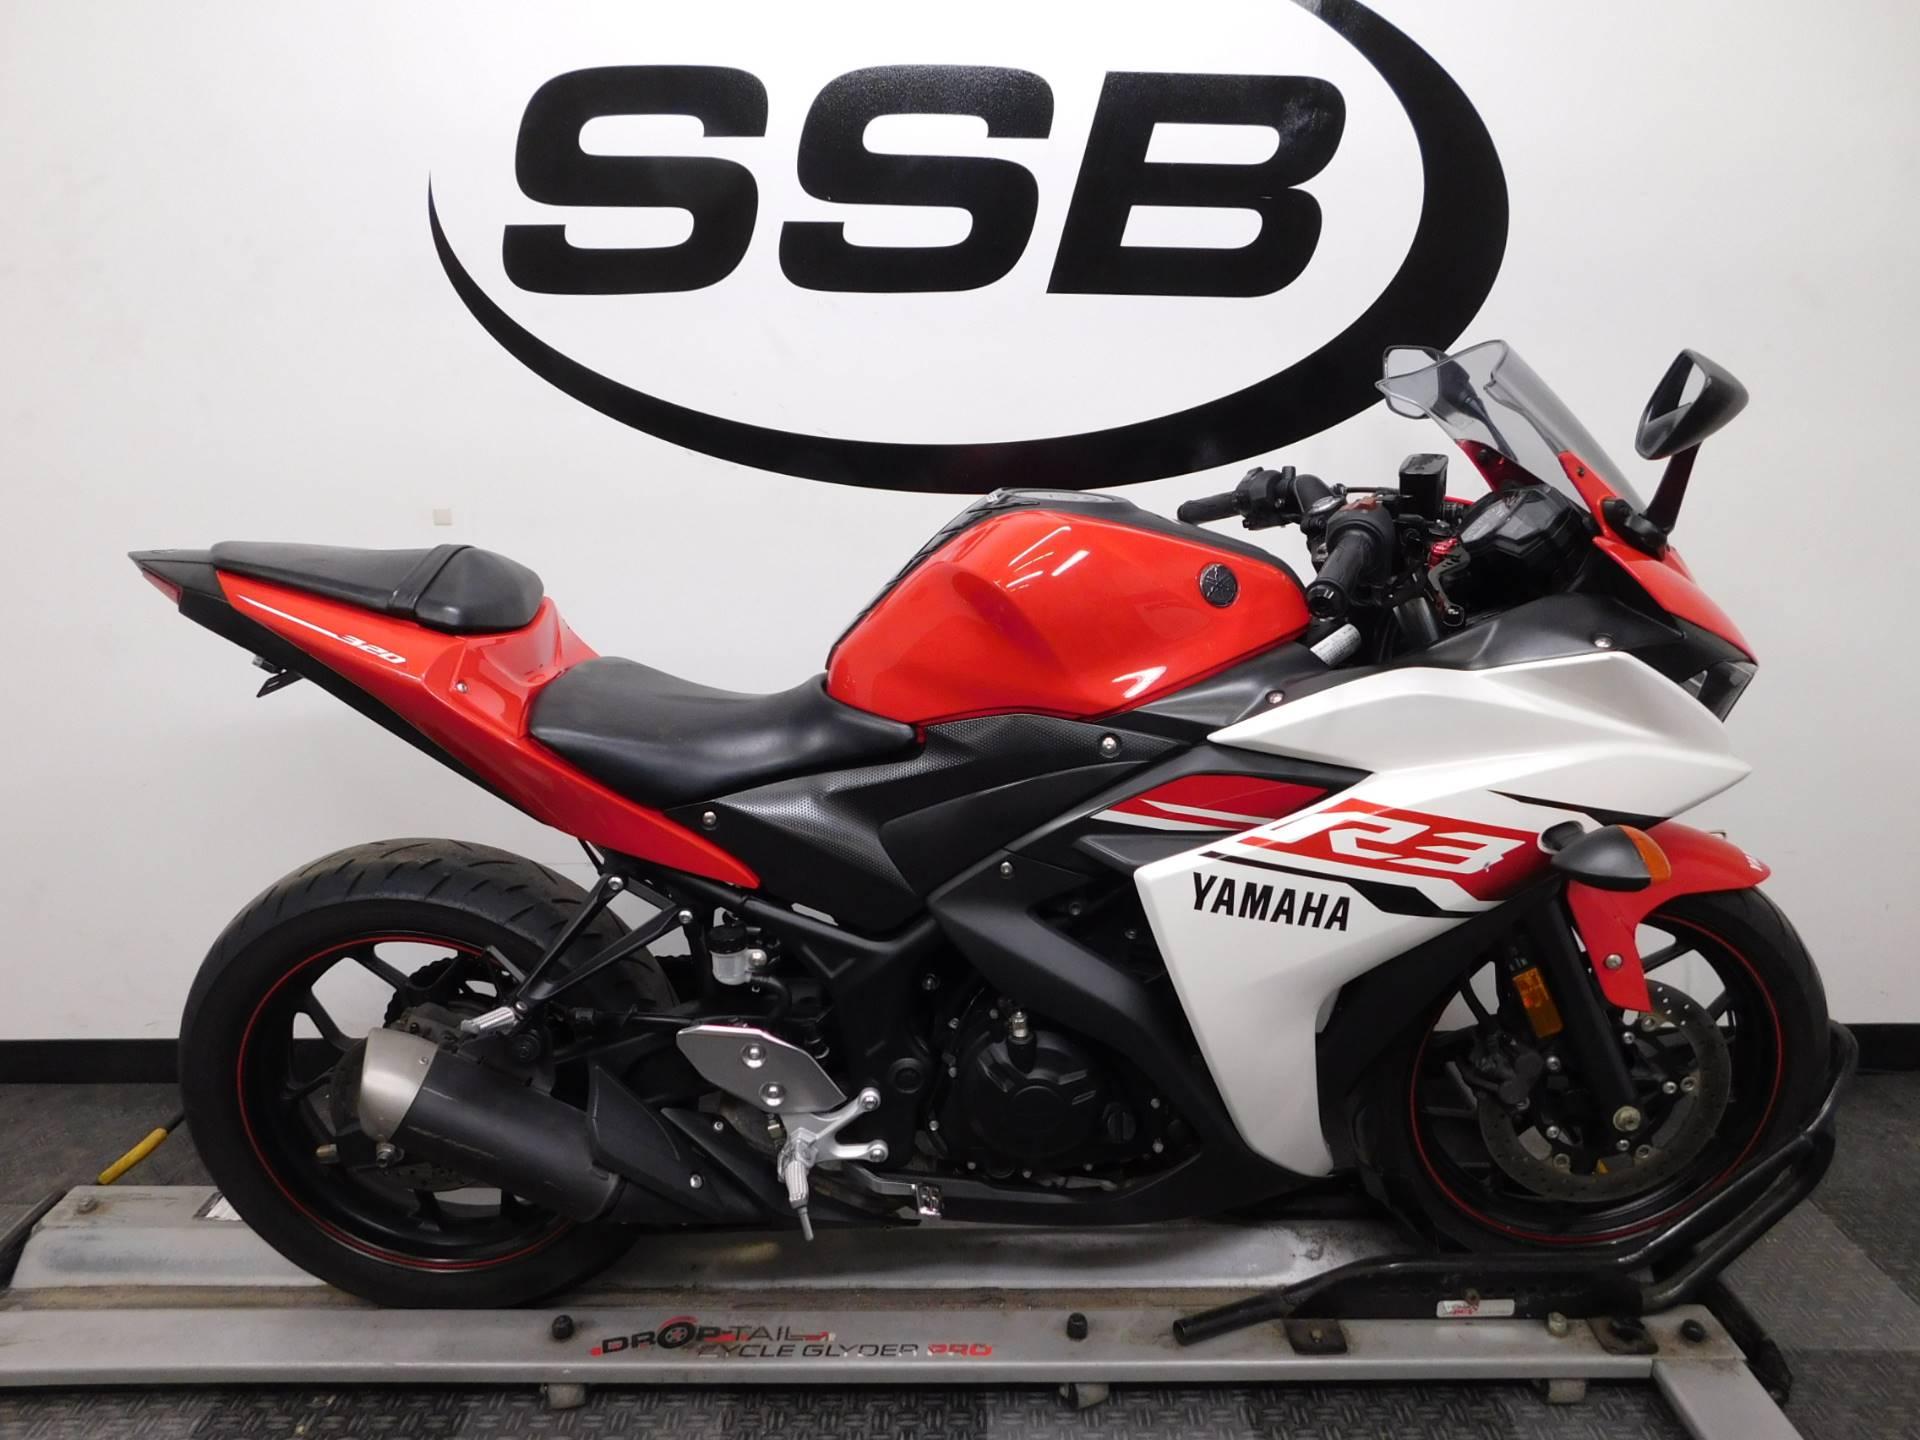 2015 Yamaha YZF-R3 for sale 31085